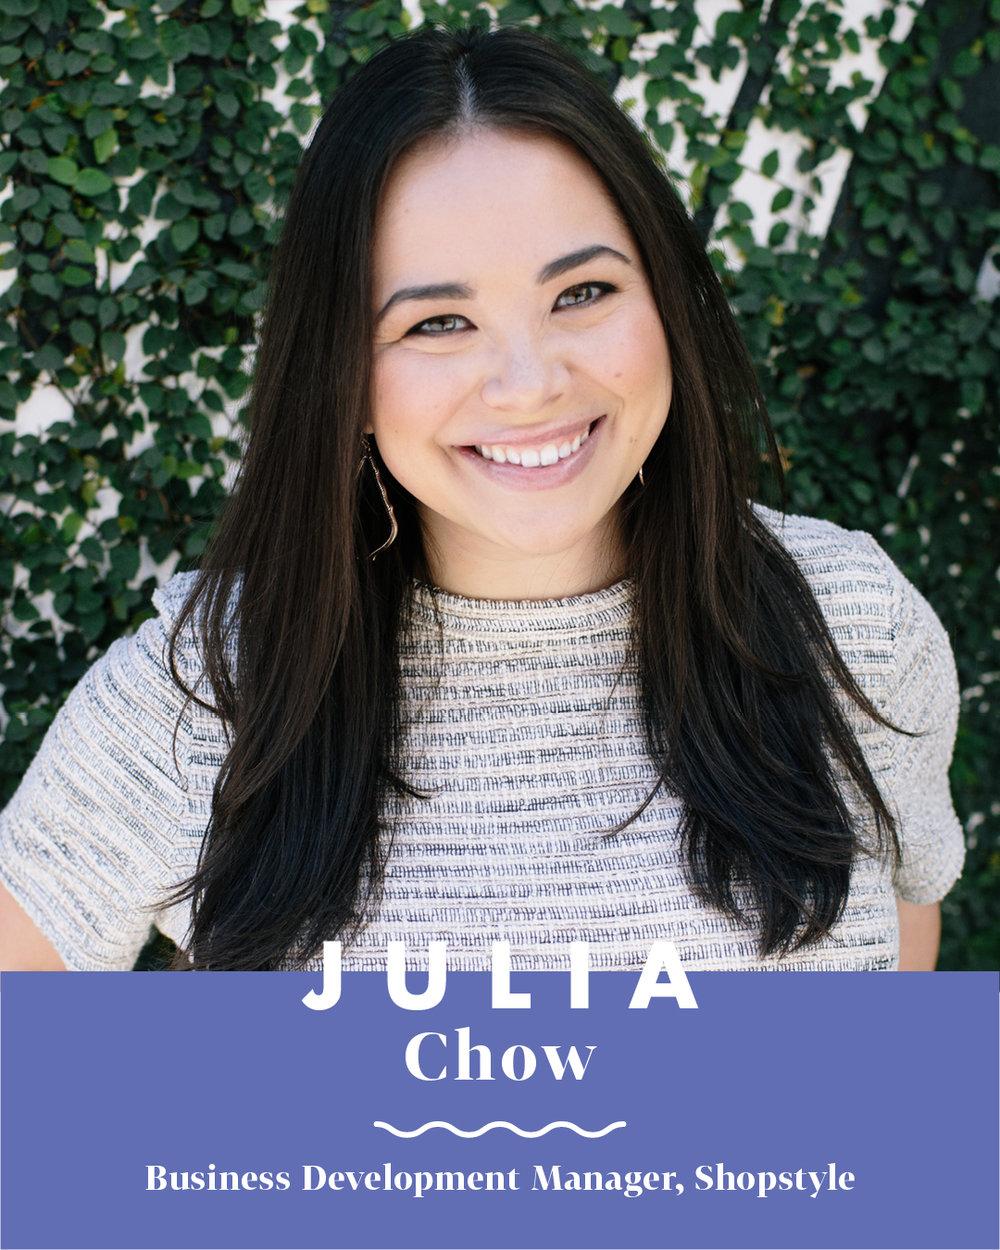 julia-chow.jpg